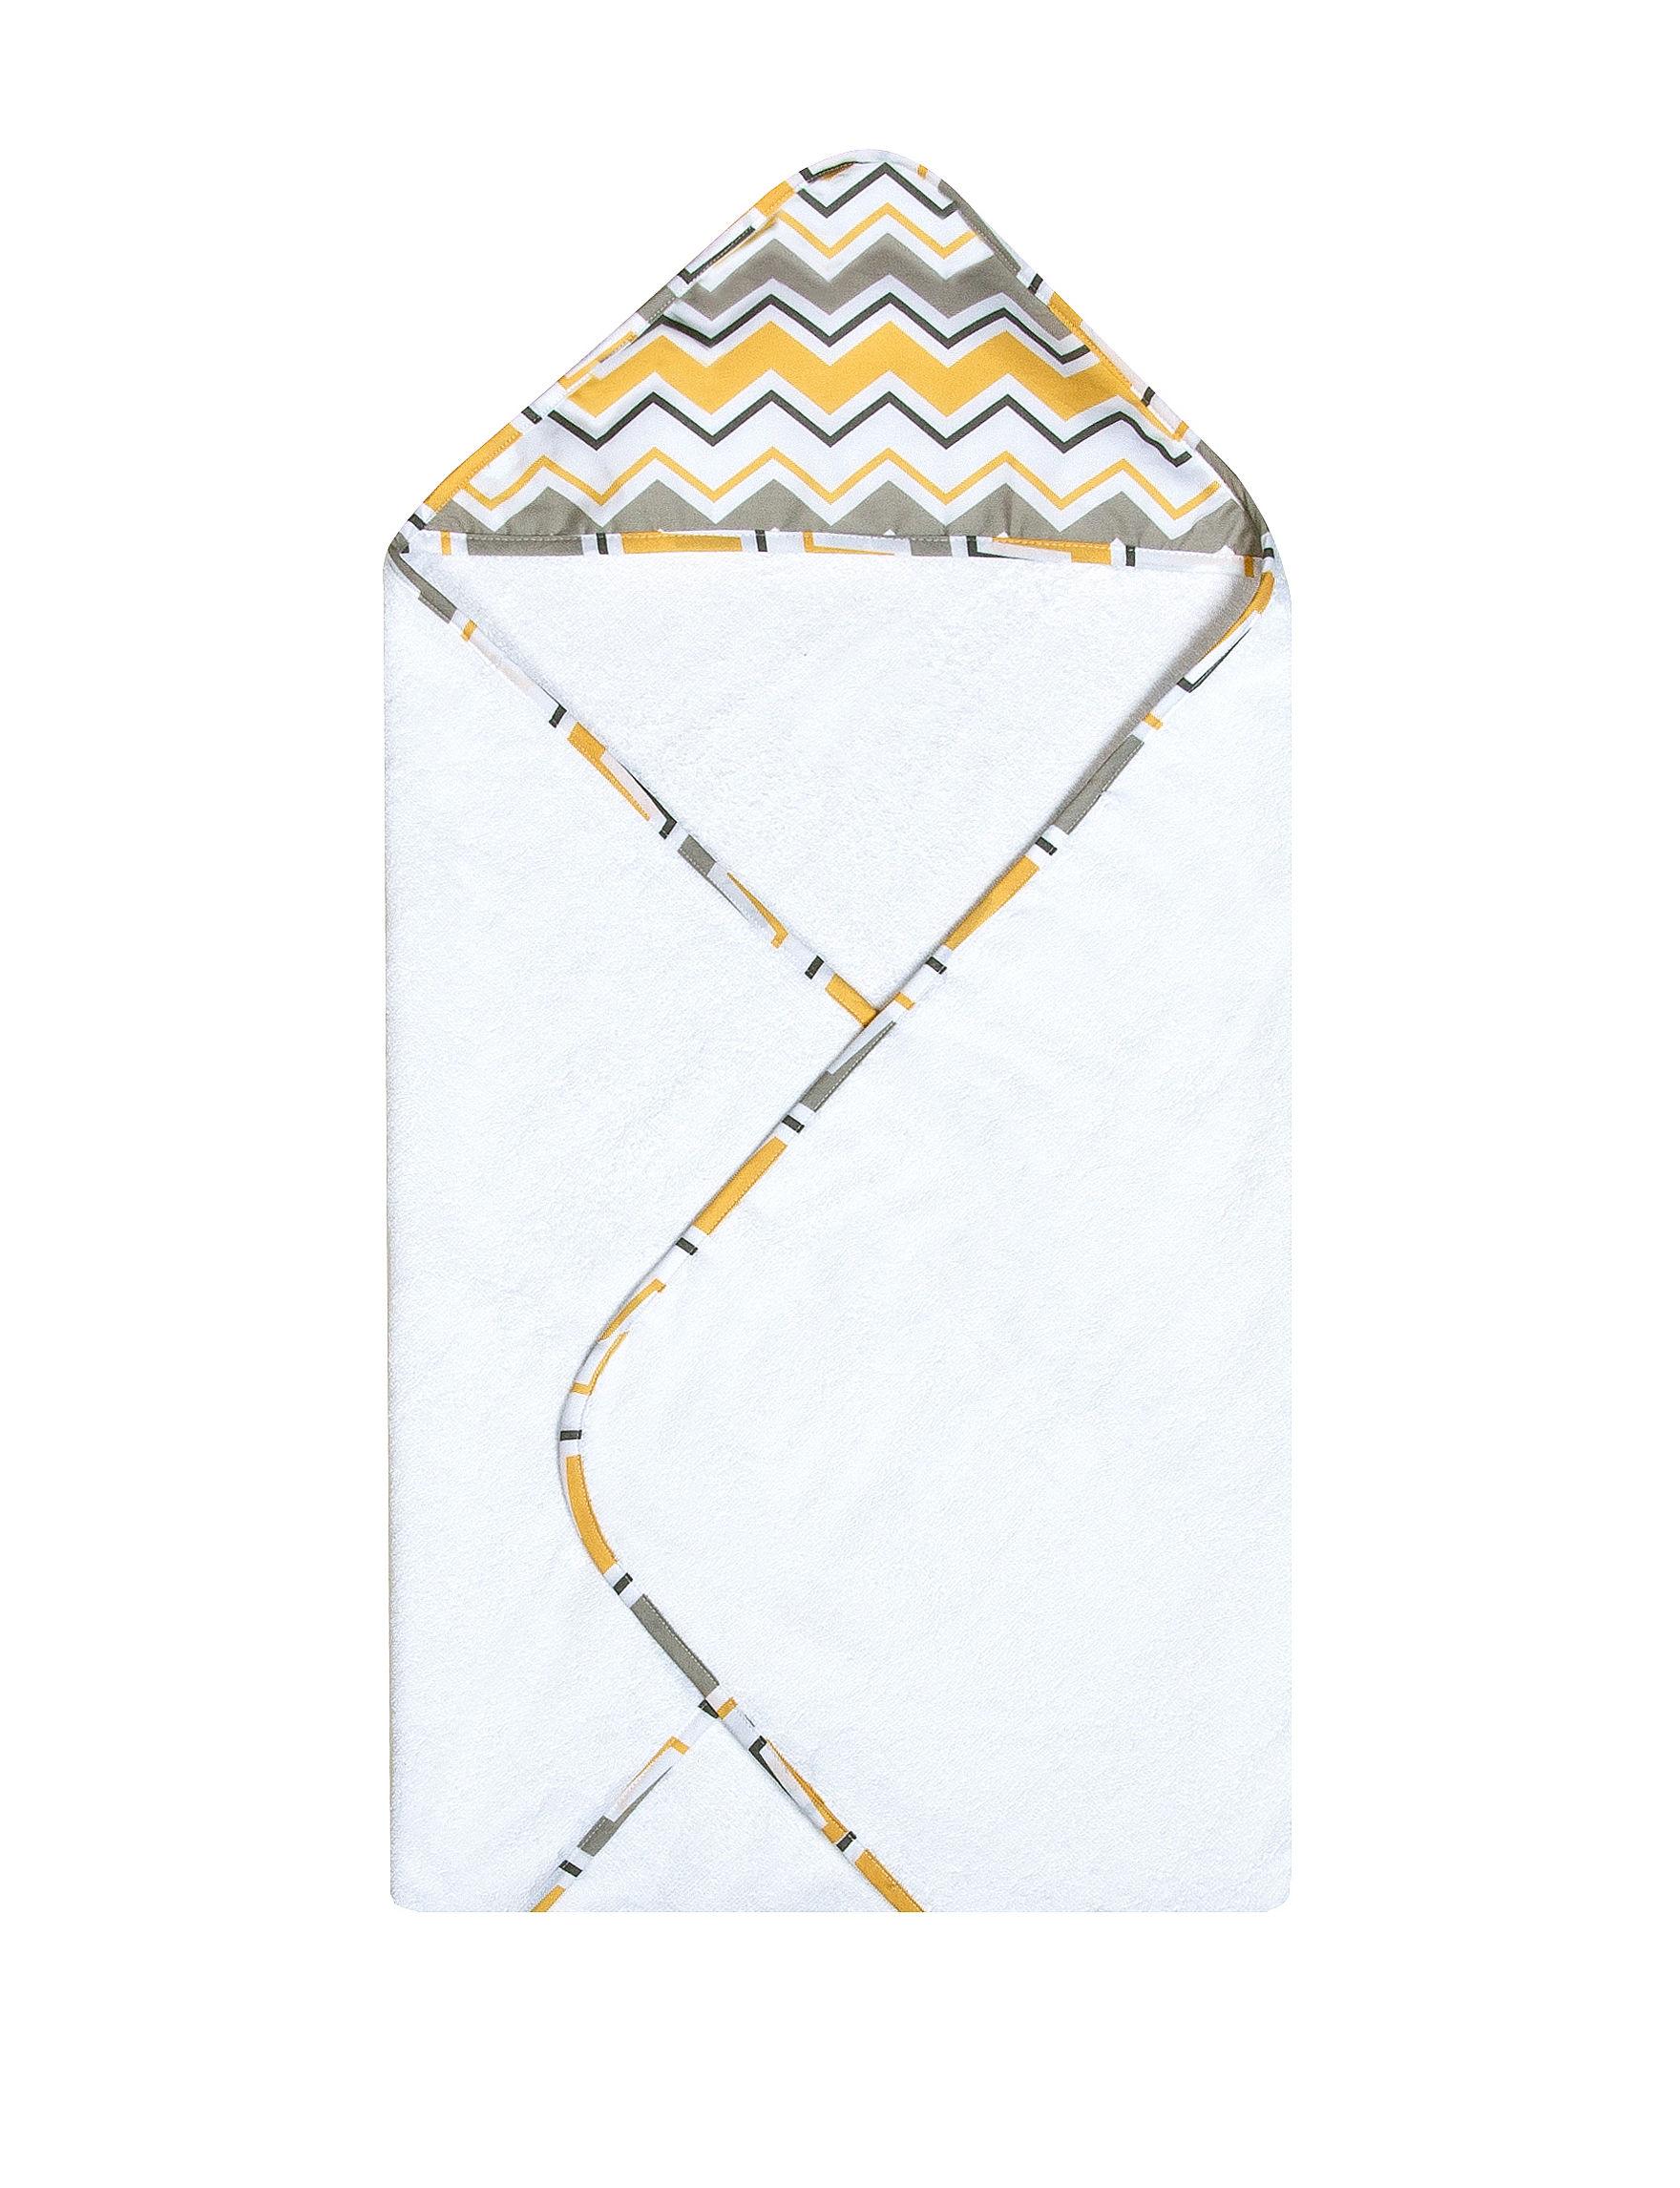 Trend Lab Multi Hooded Towels